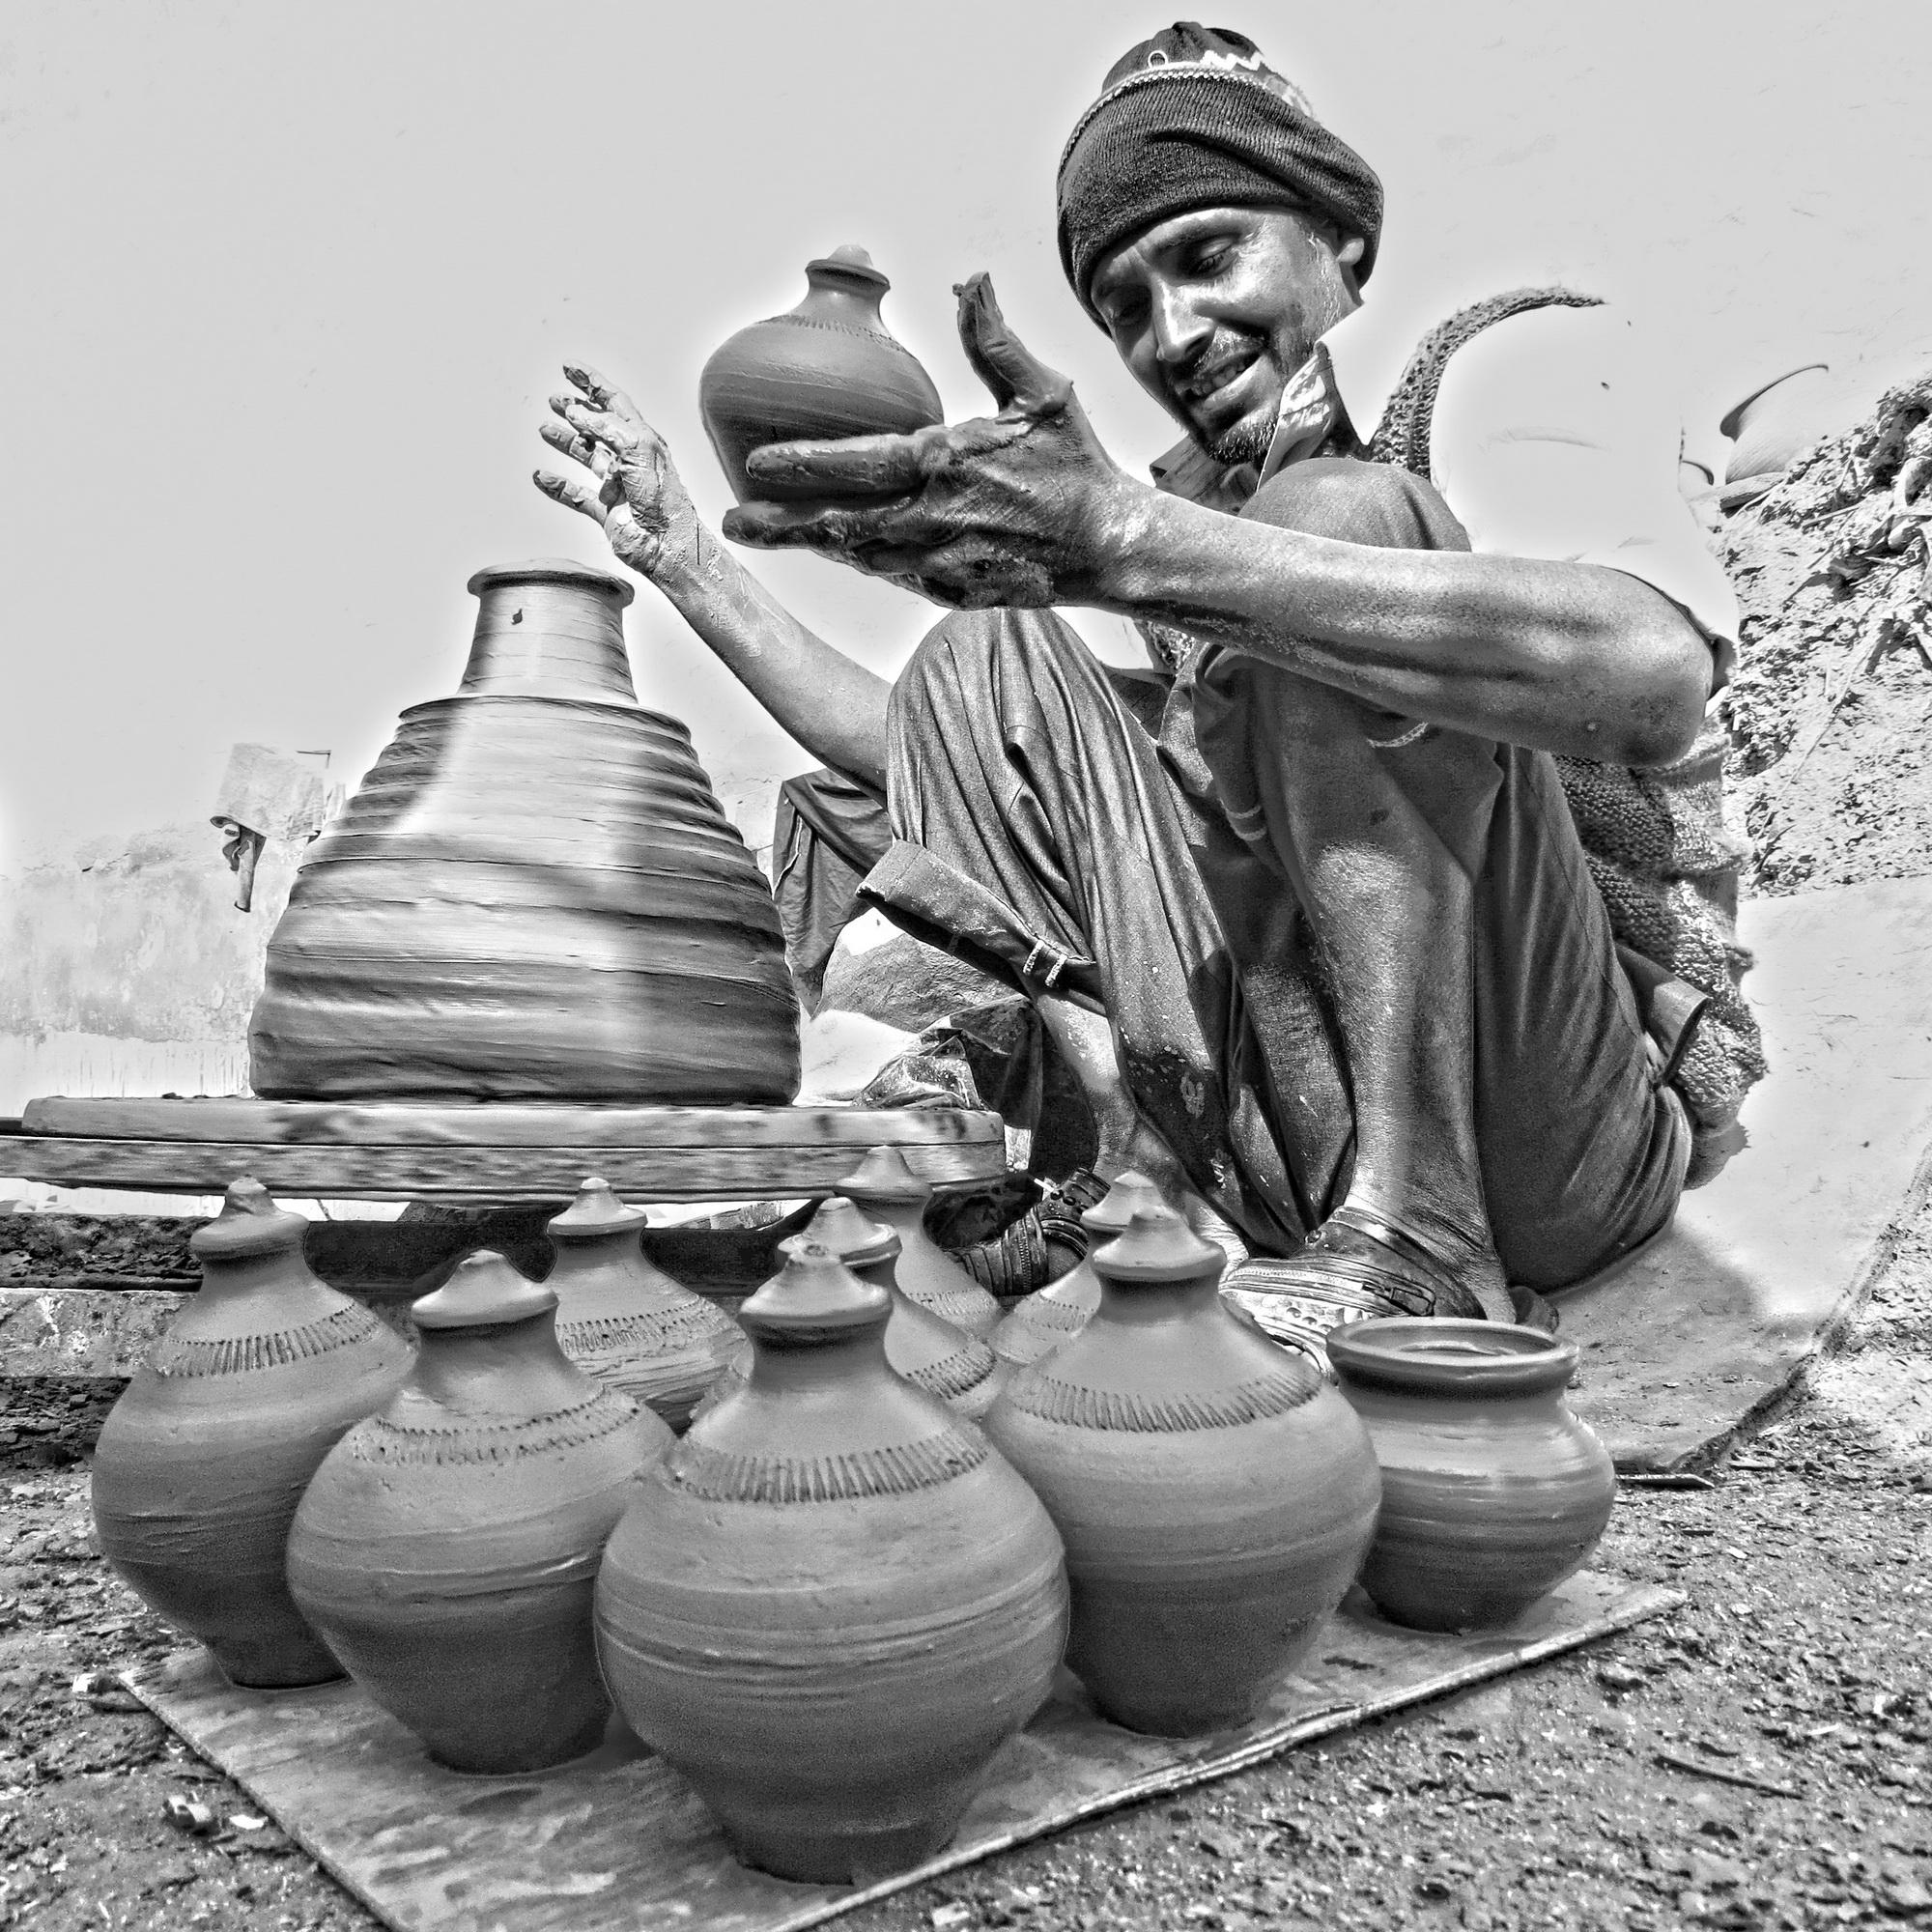 Potter at Kumhargaon, the potters' village at the outskirts of Delhi